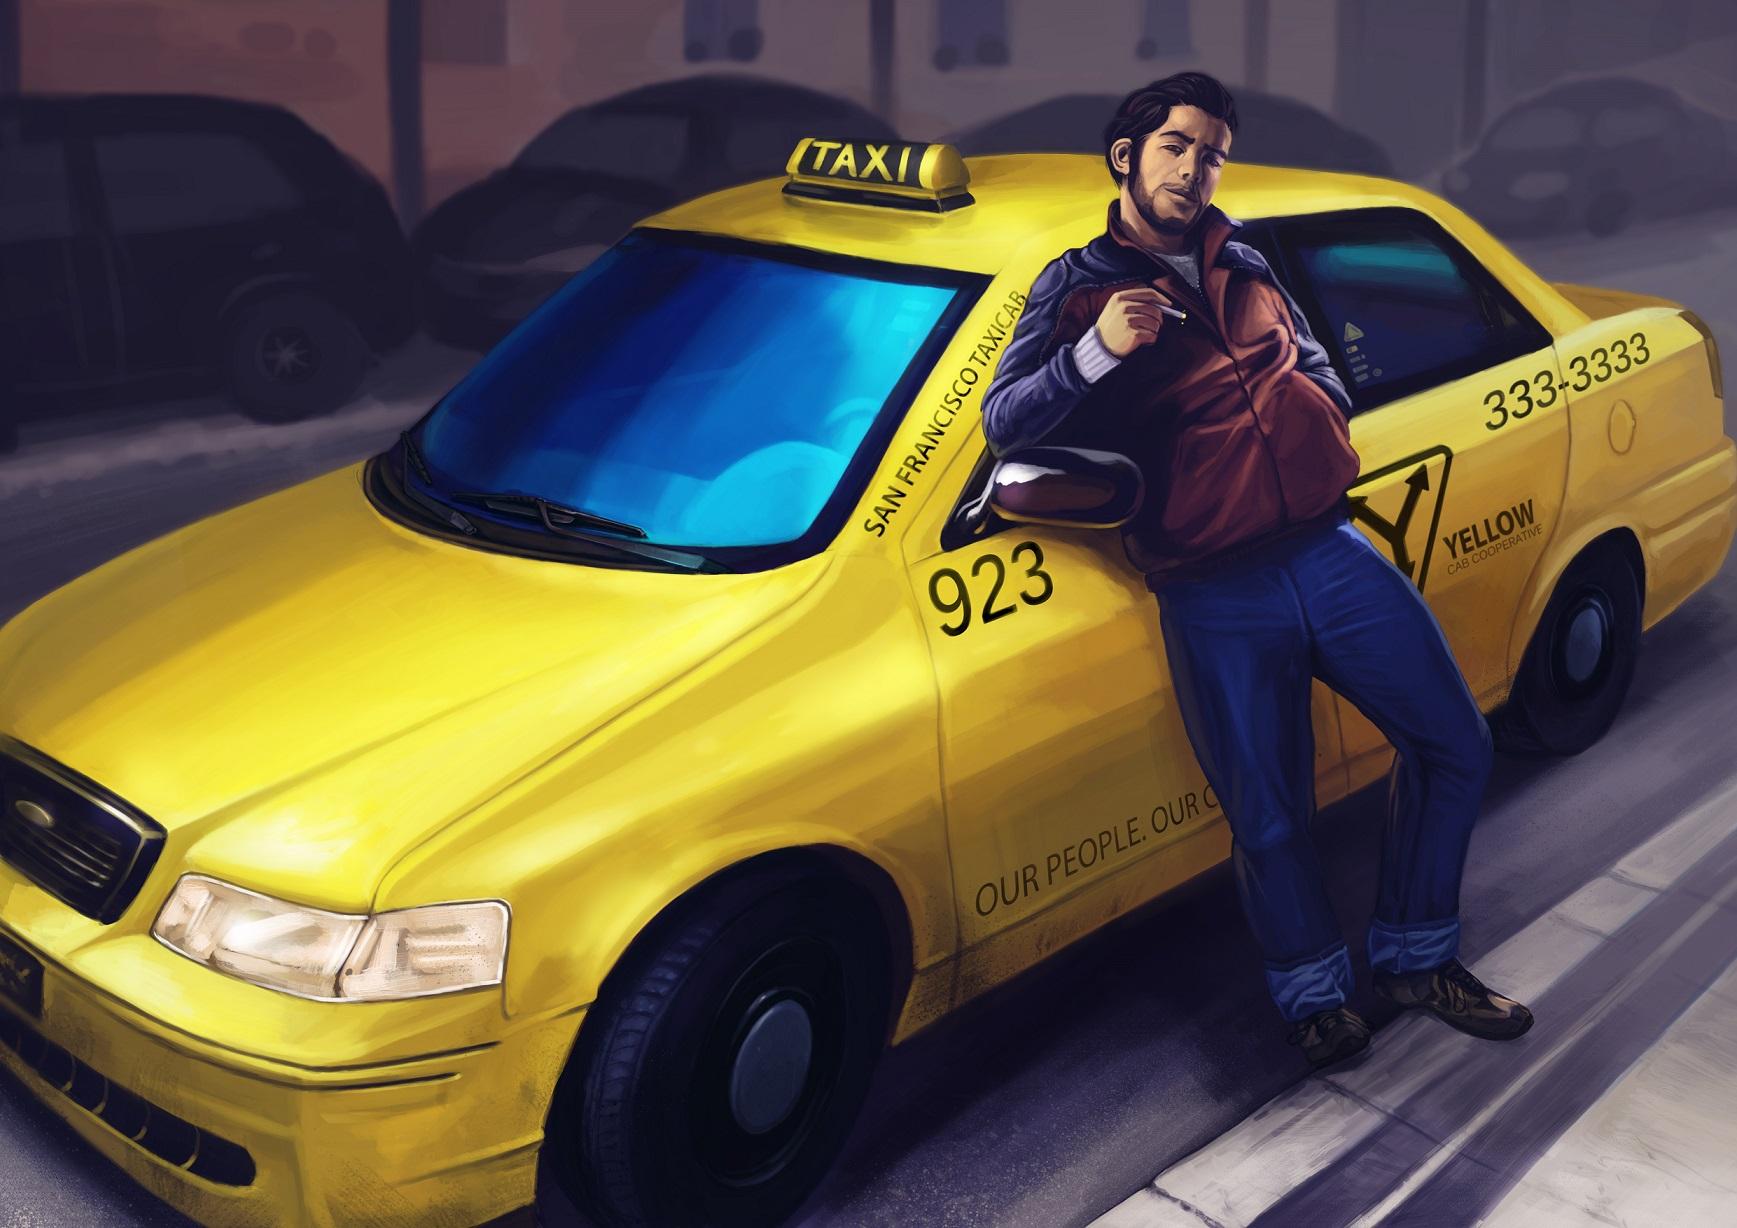 erol taxi